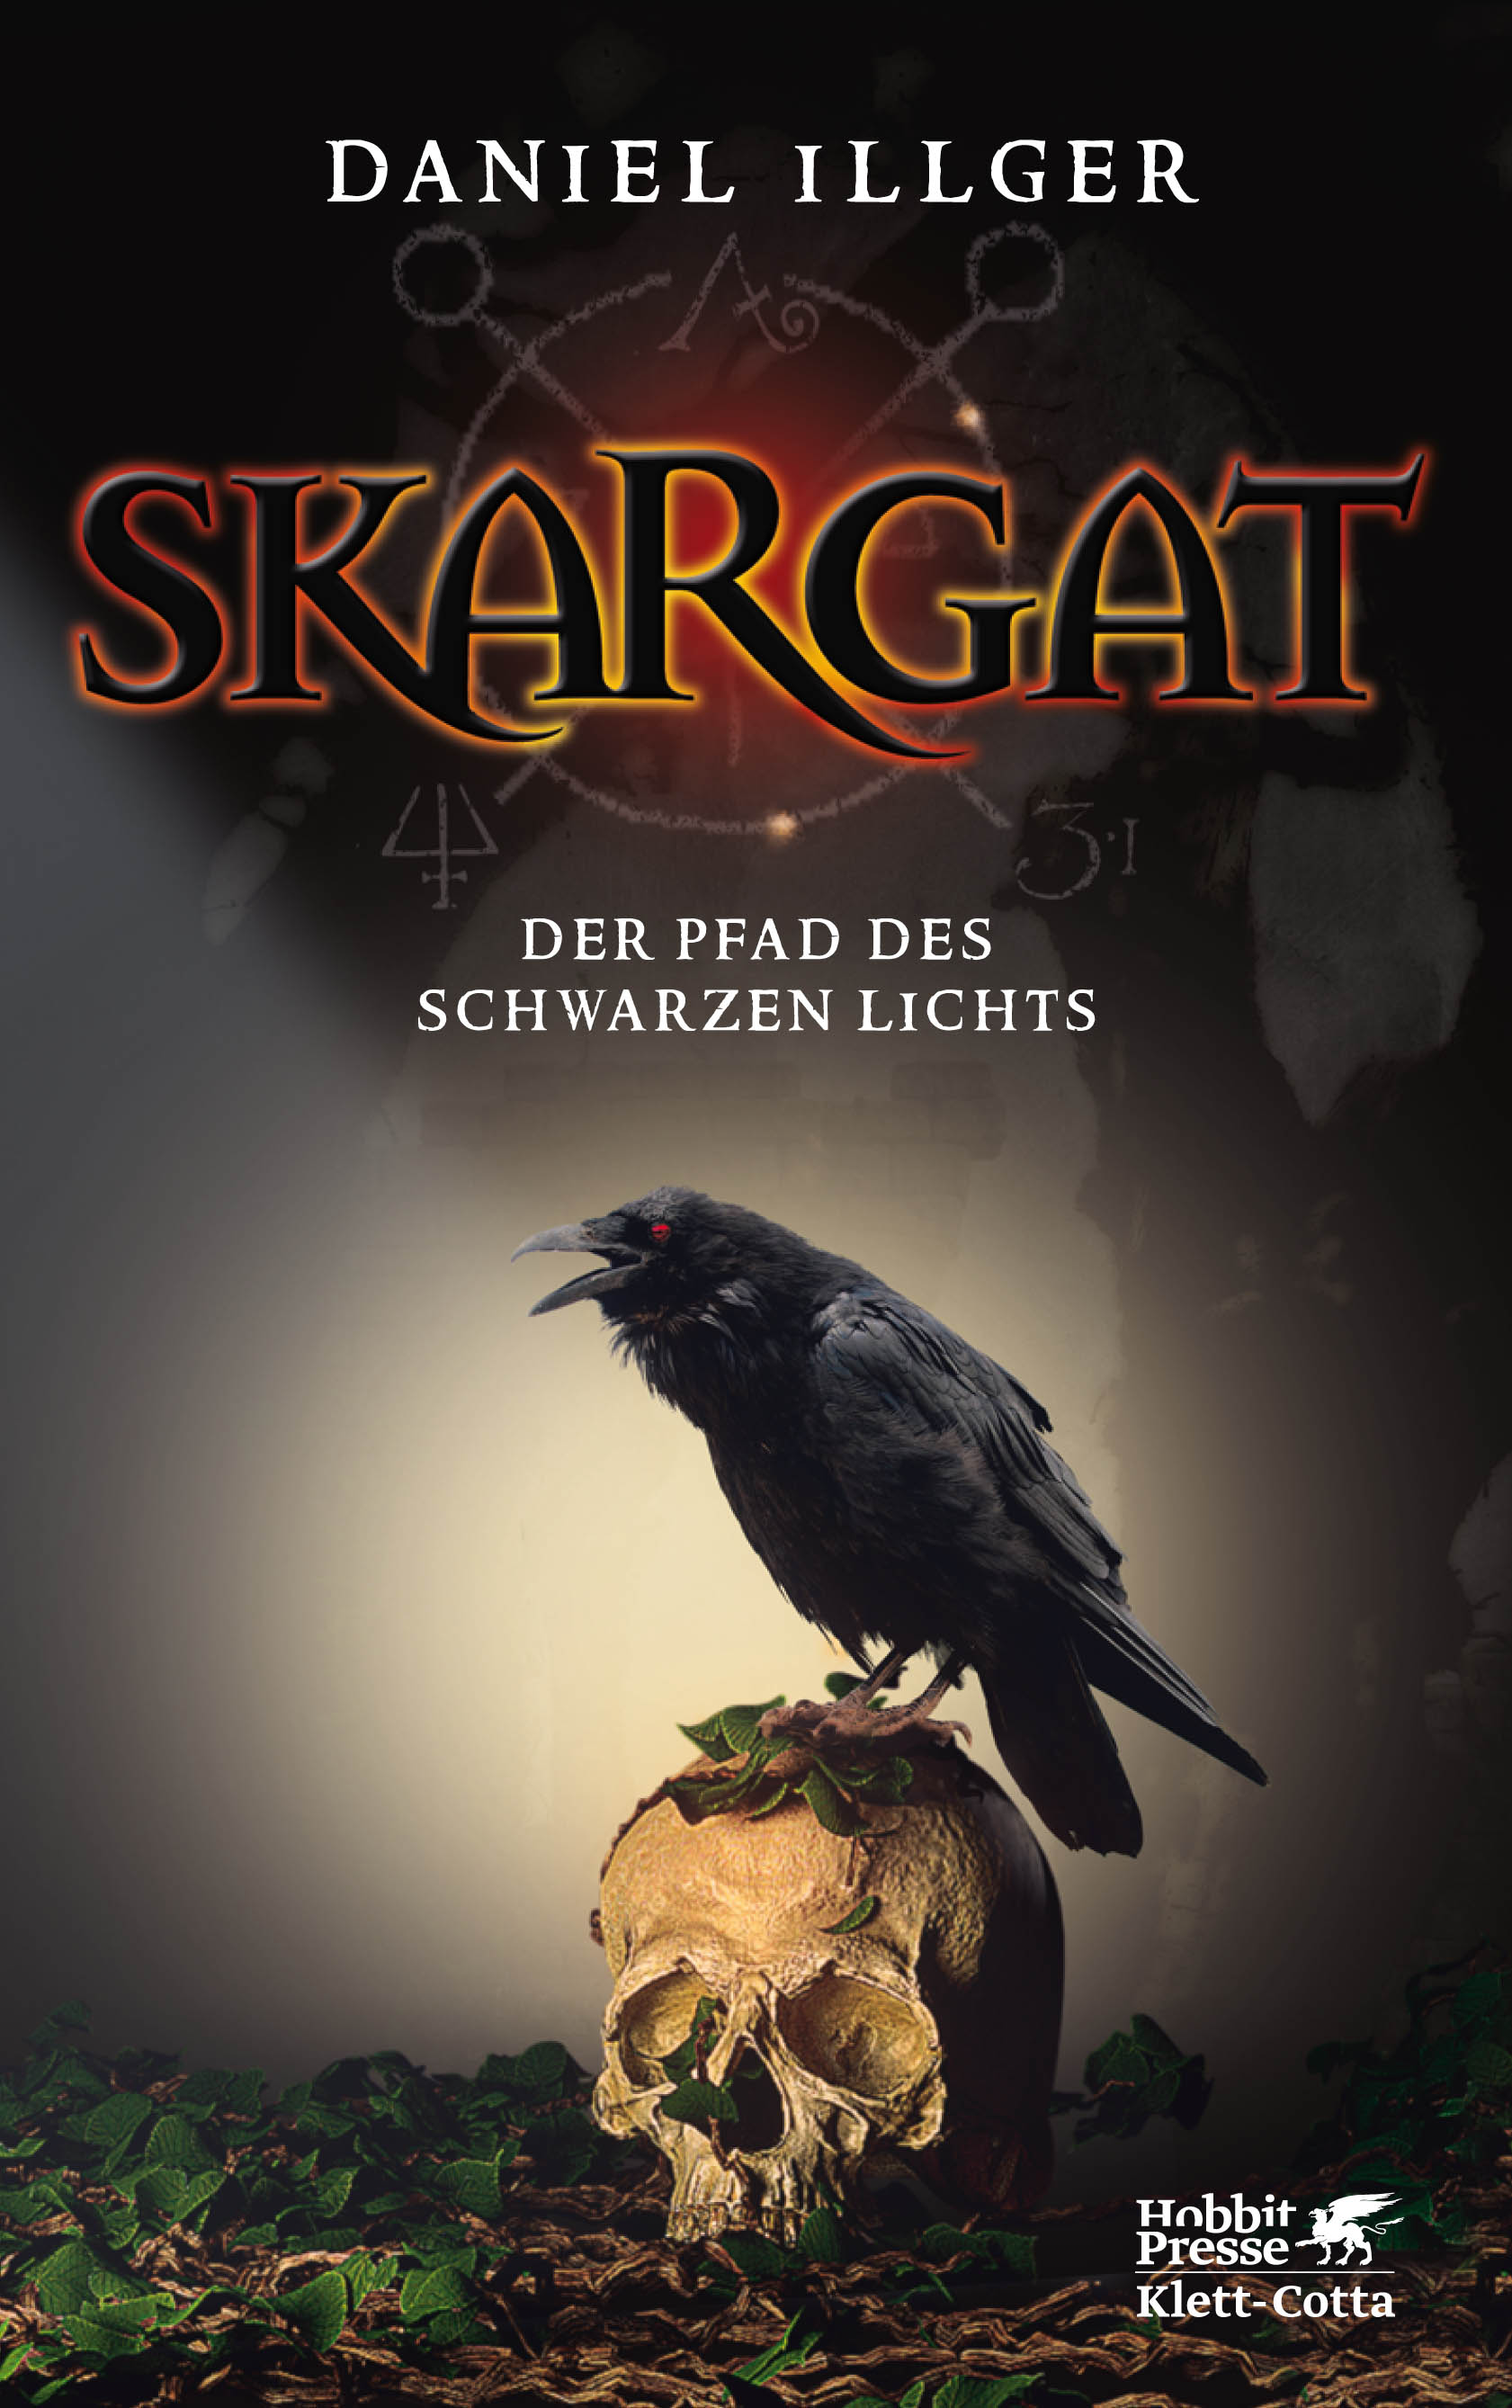 illger_daniel_skargat1_phantastik-autoren-netzwerk.jpg